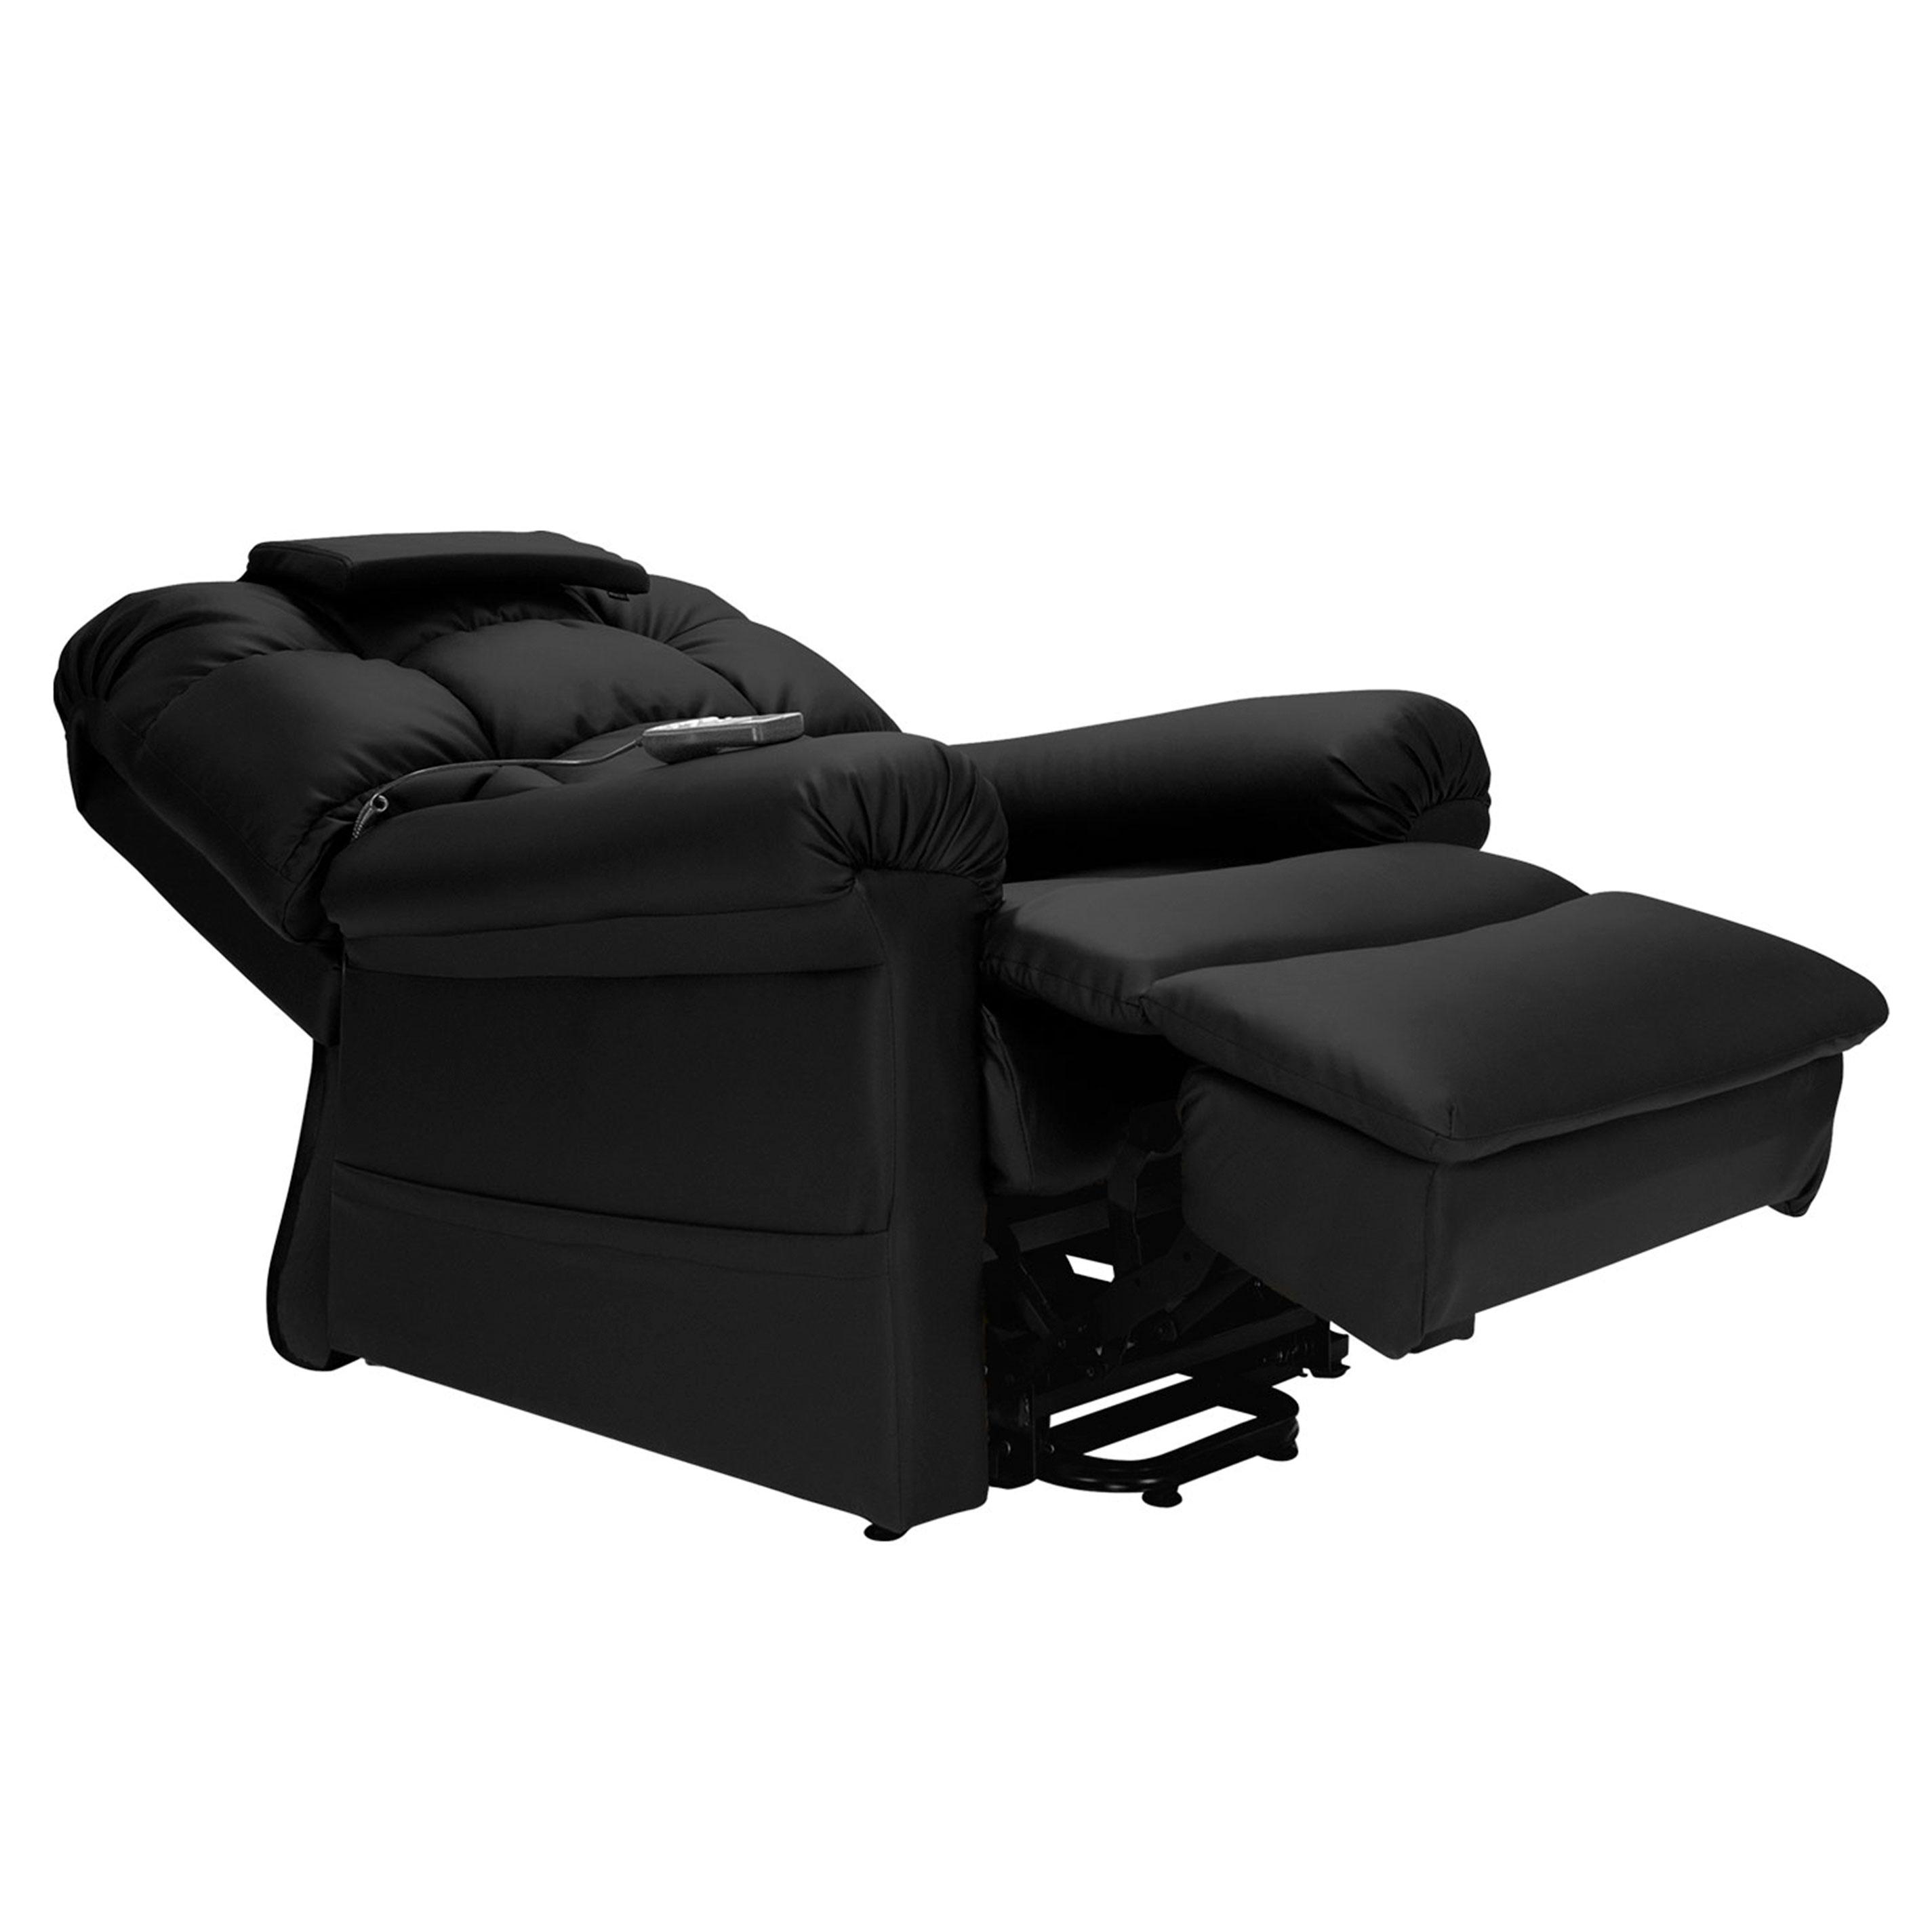 Superb Wiselift 450 Sleeper Lift Chair Recliner Midnight Enduralux Leather Machost Co Dining Chair Design Ideas Machostcouk